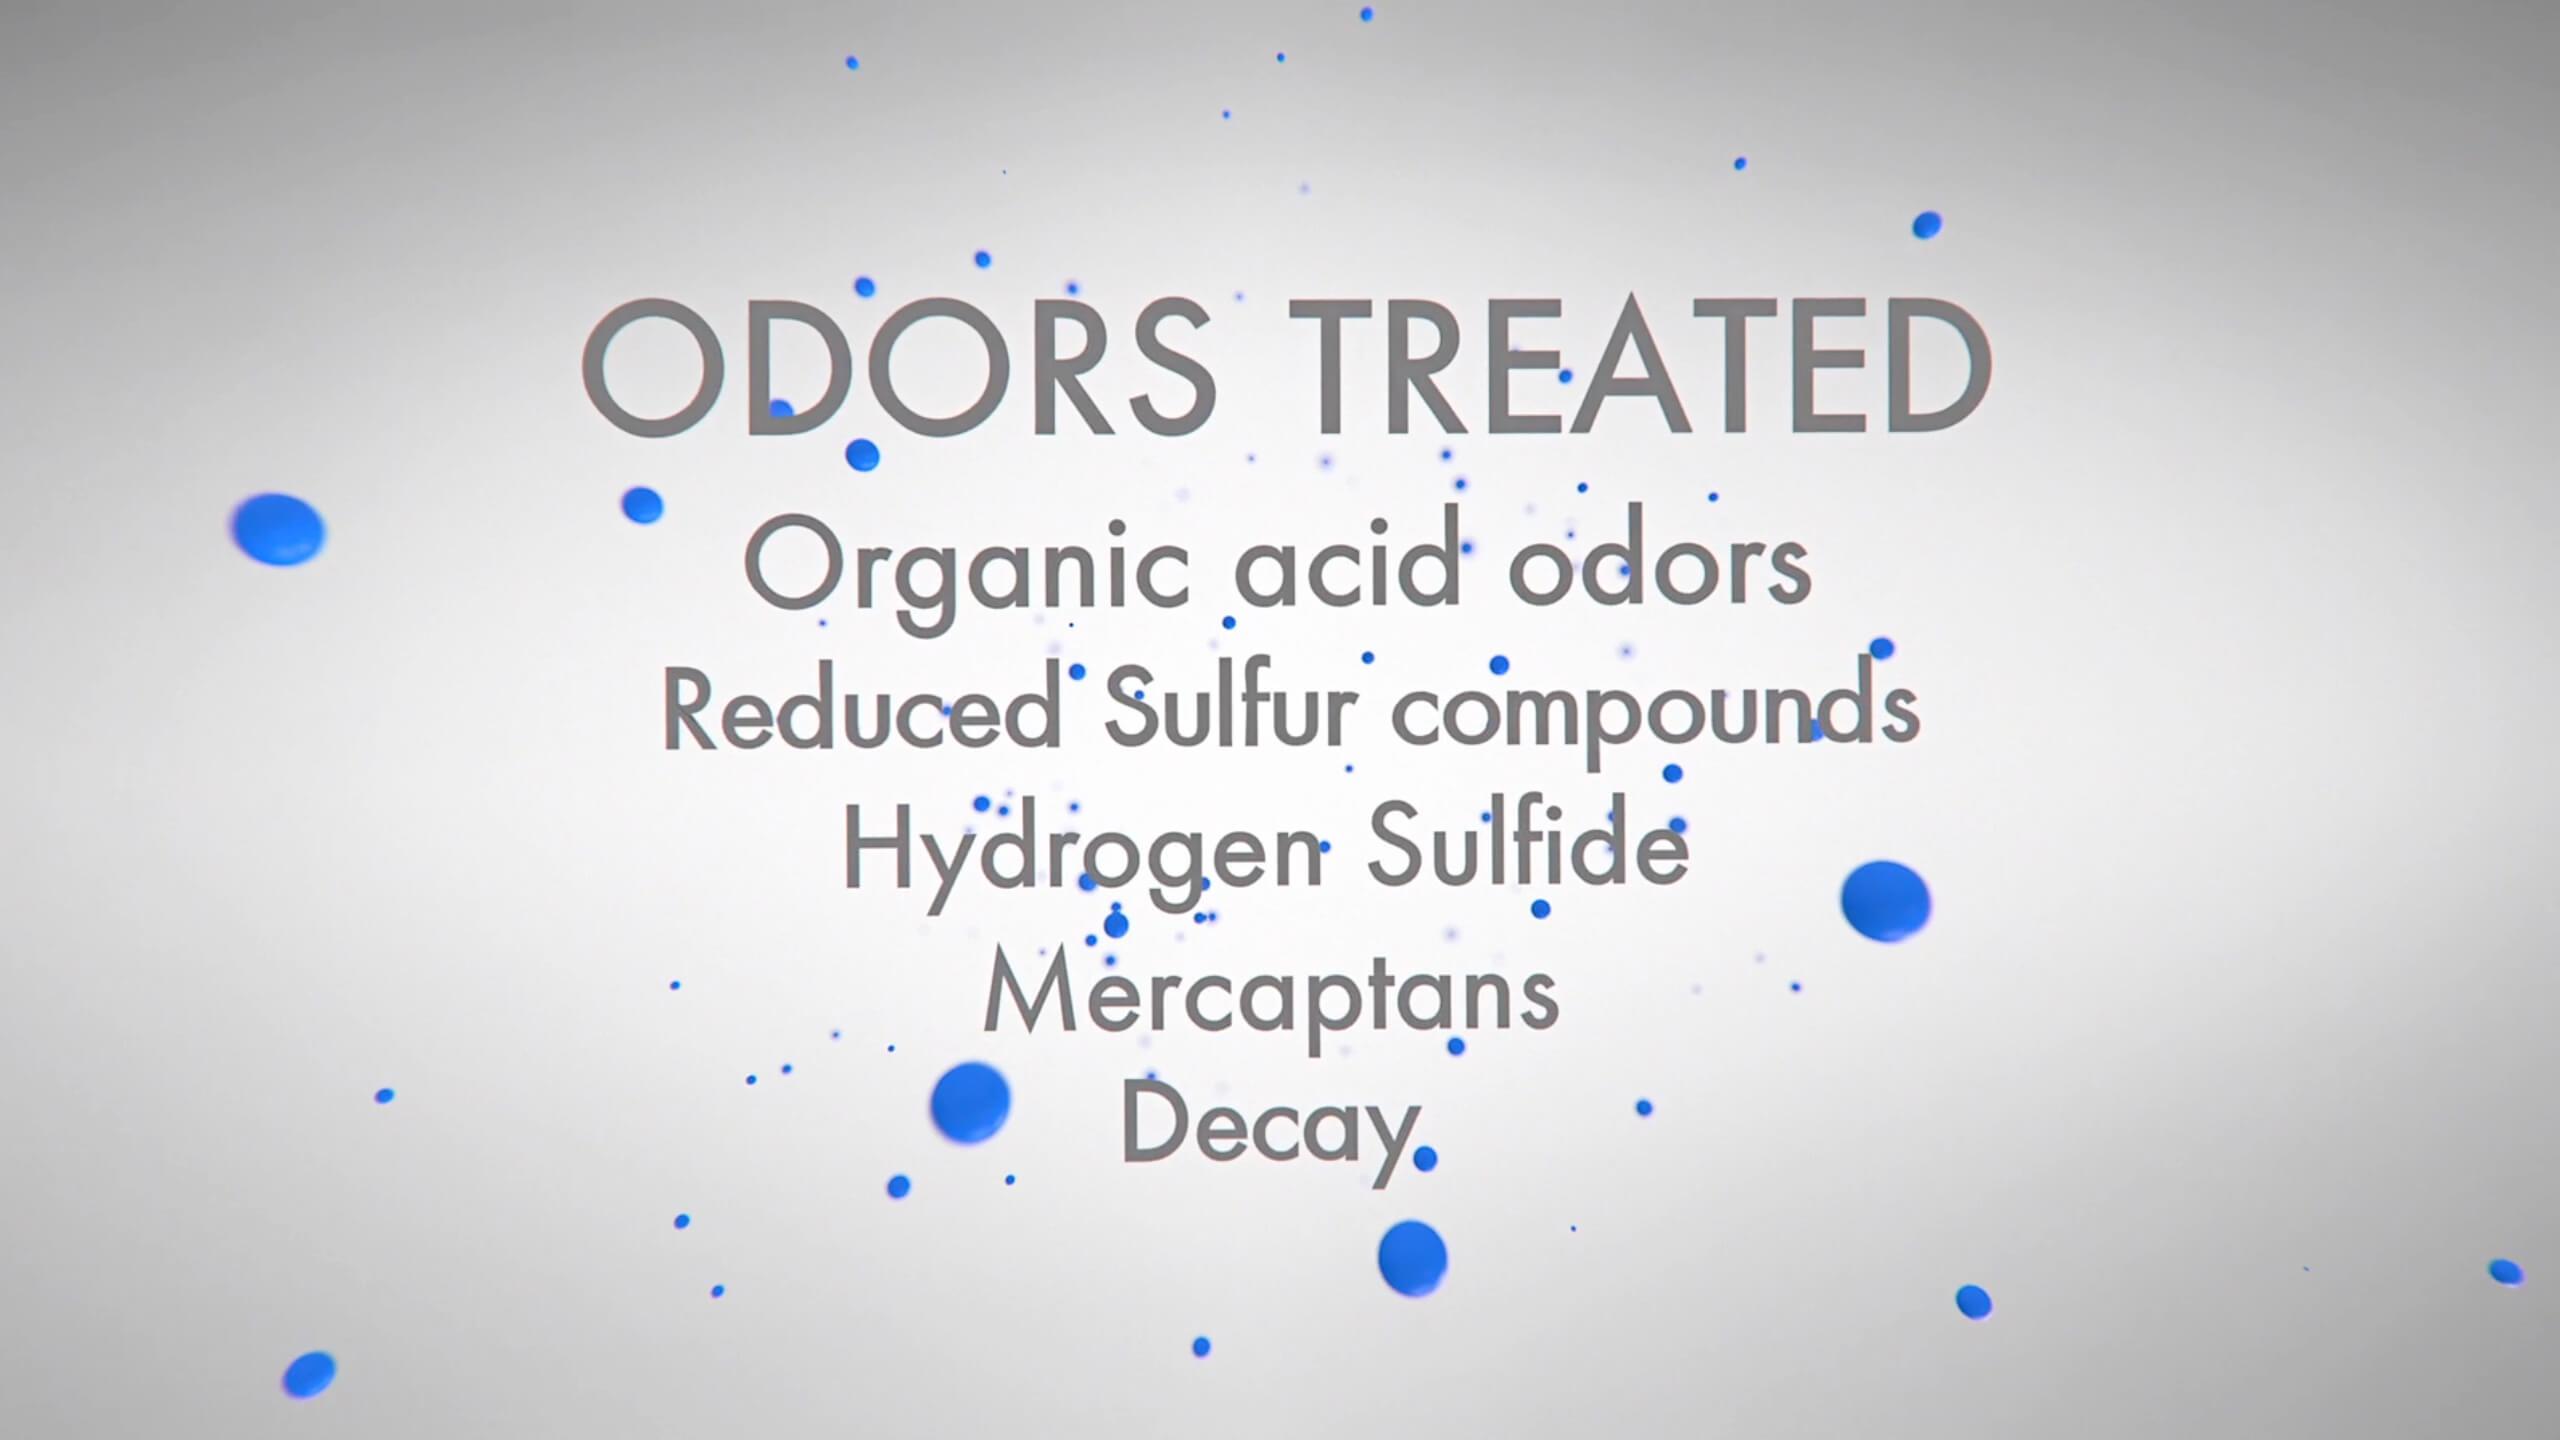 ECOLO air Freshener - Commercial CGI Film by NDIGITEC